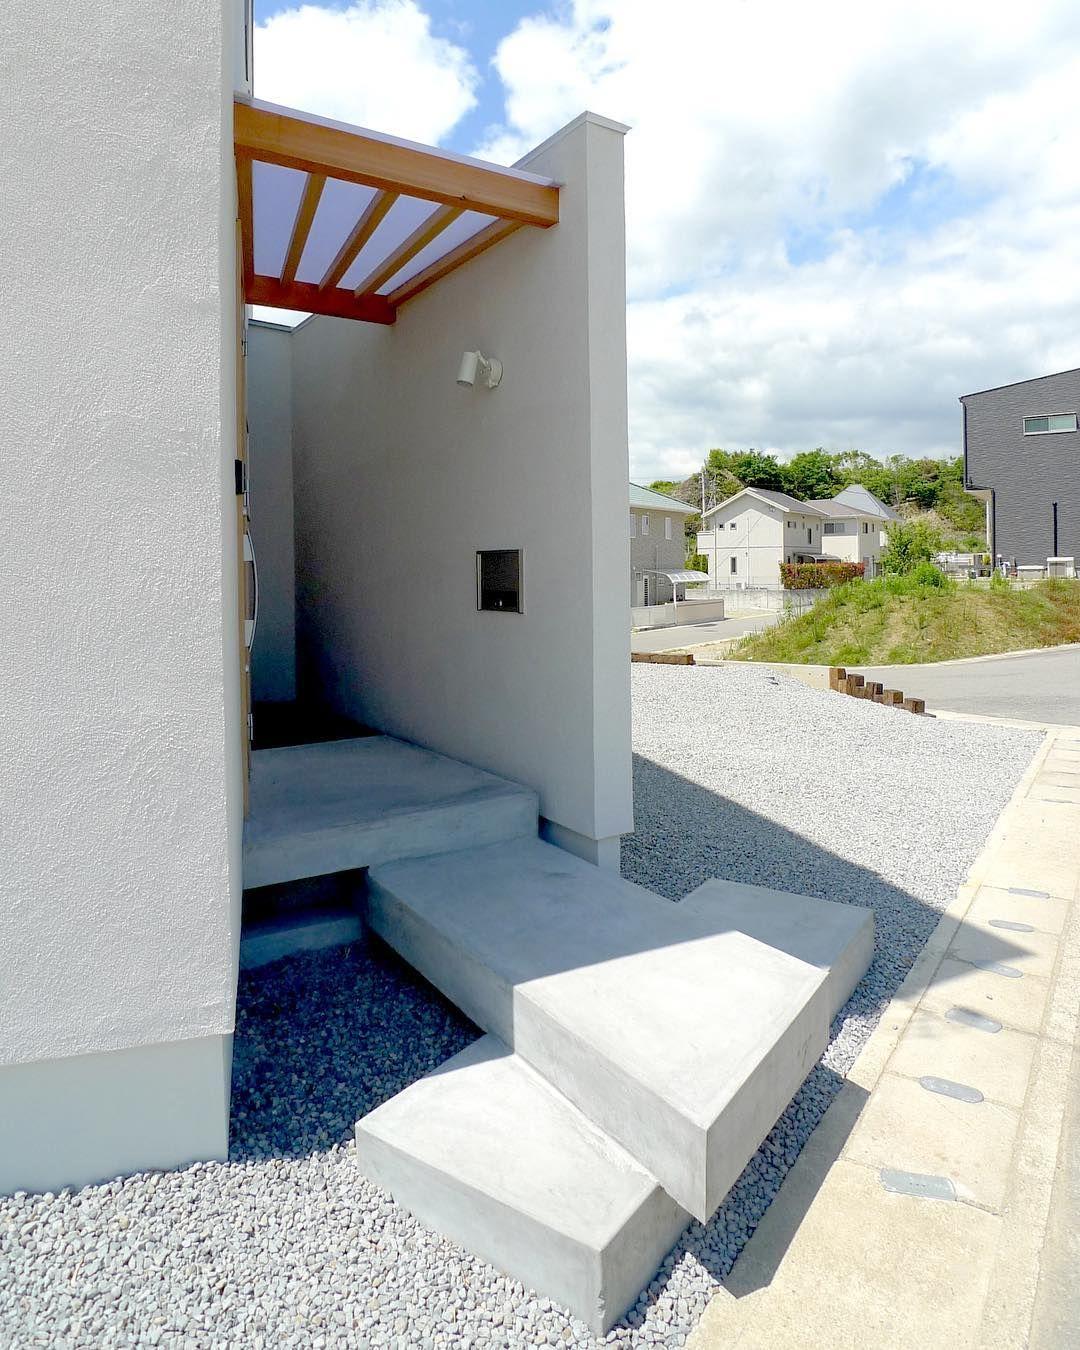 Minimaru Design On Instagram コンクリートを重ねたような形の玄関